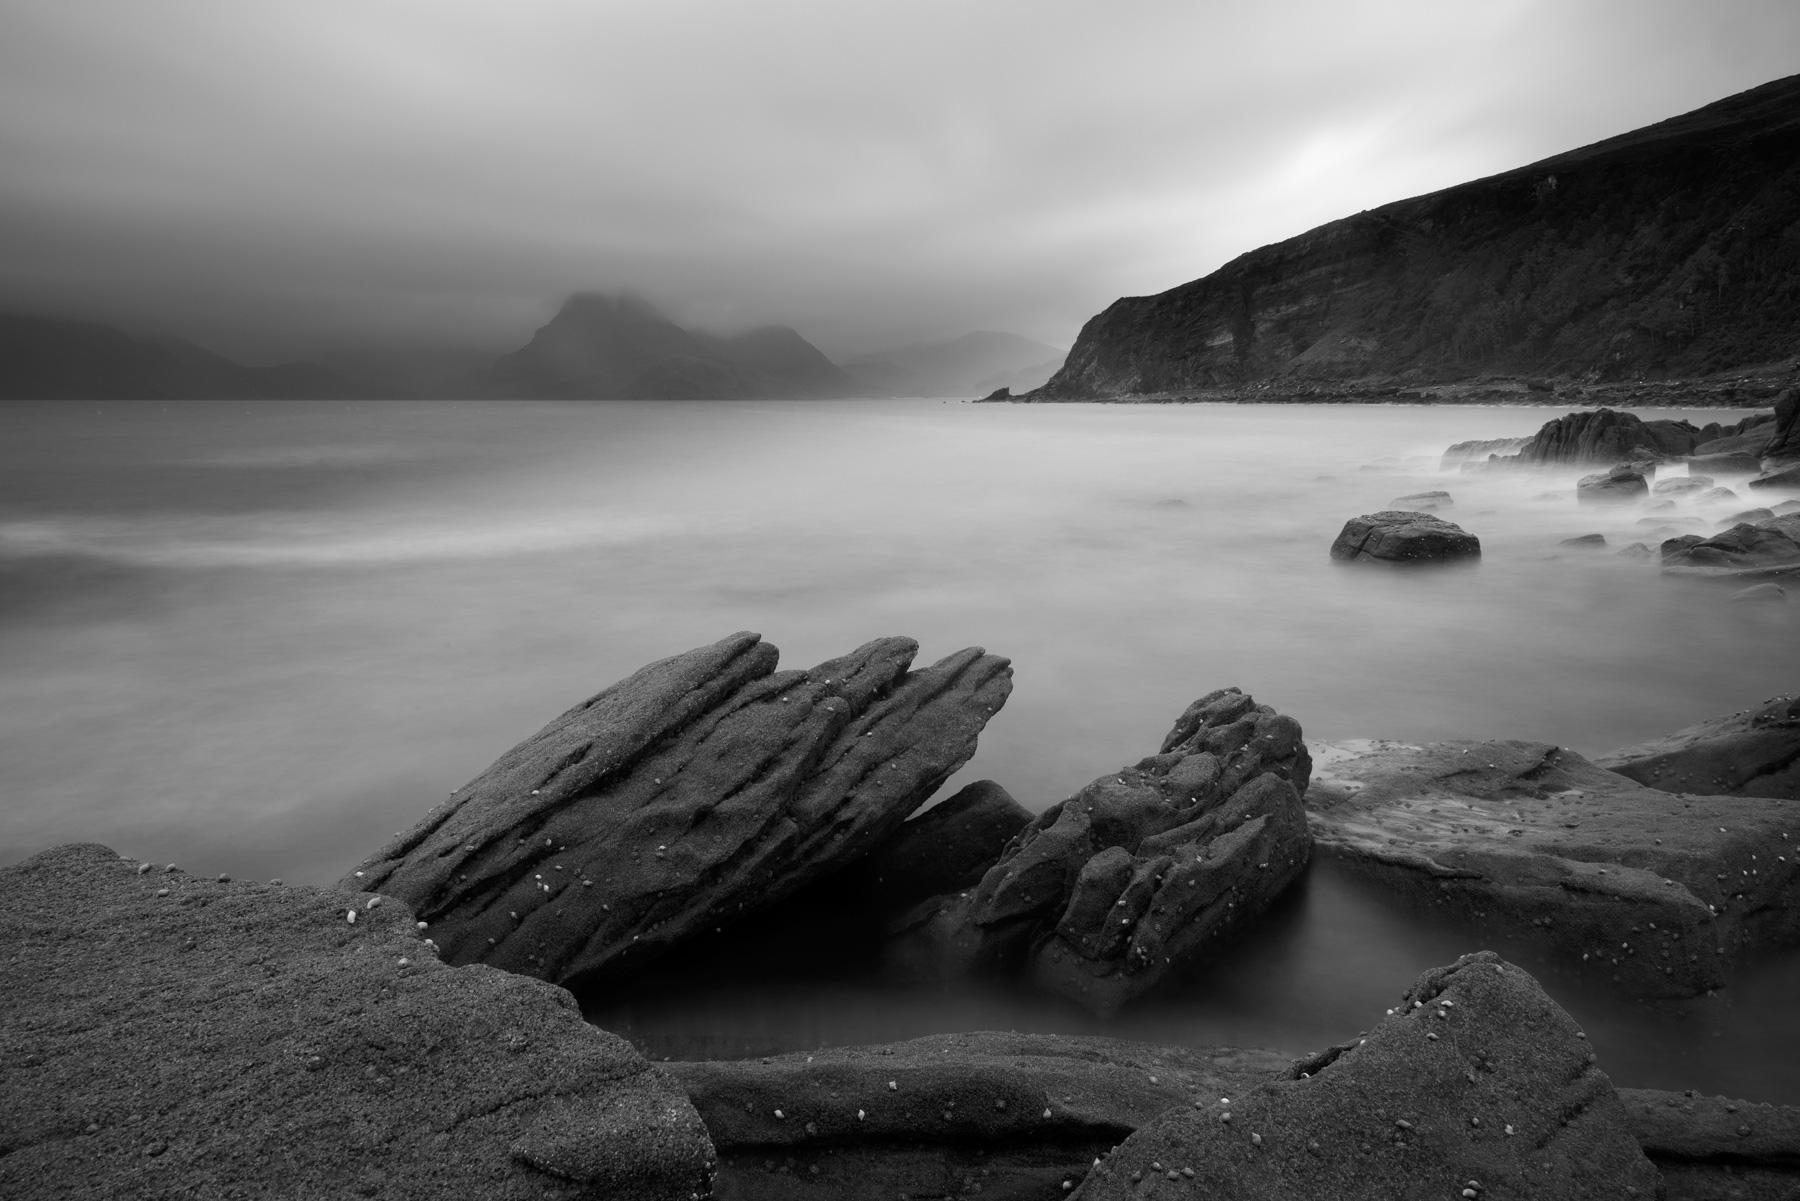 Stimmungsvoller Sonnenuntergang Elgol, Insel Skye, Schottland